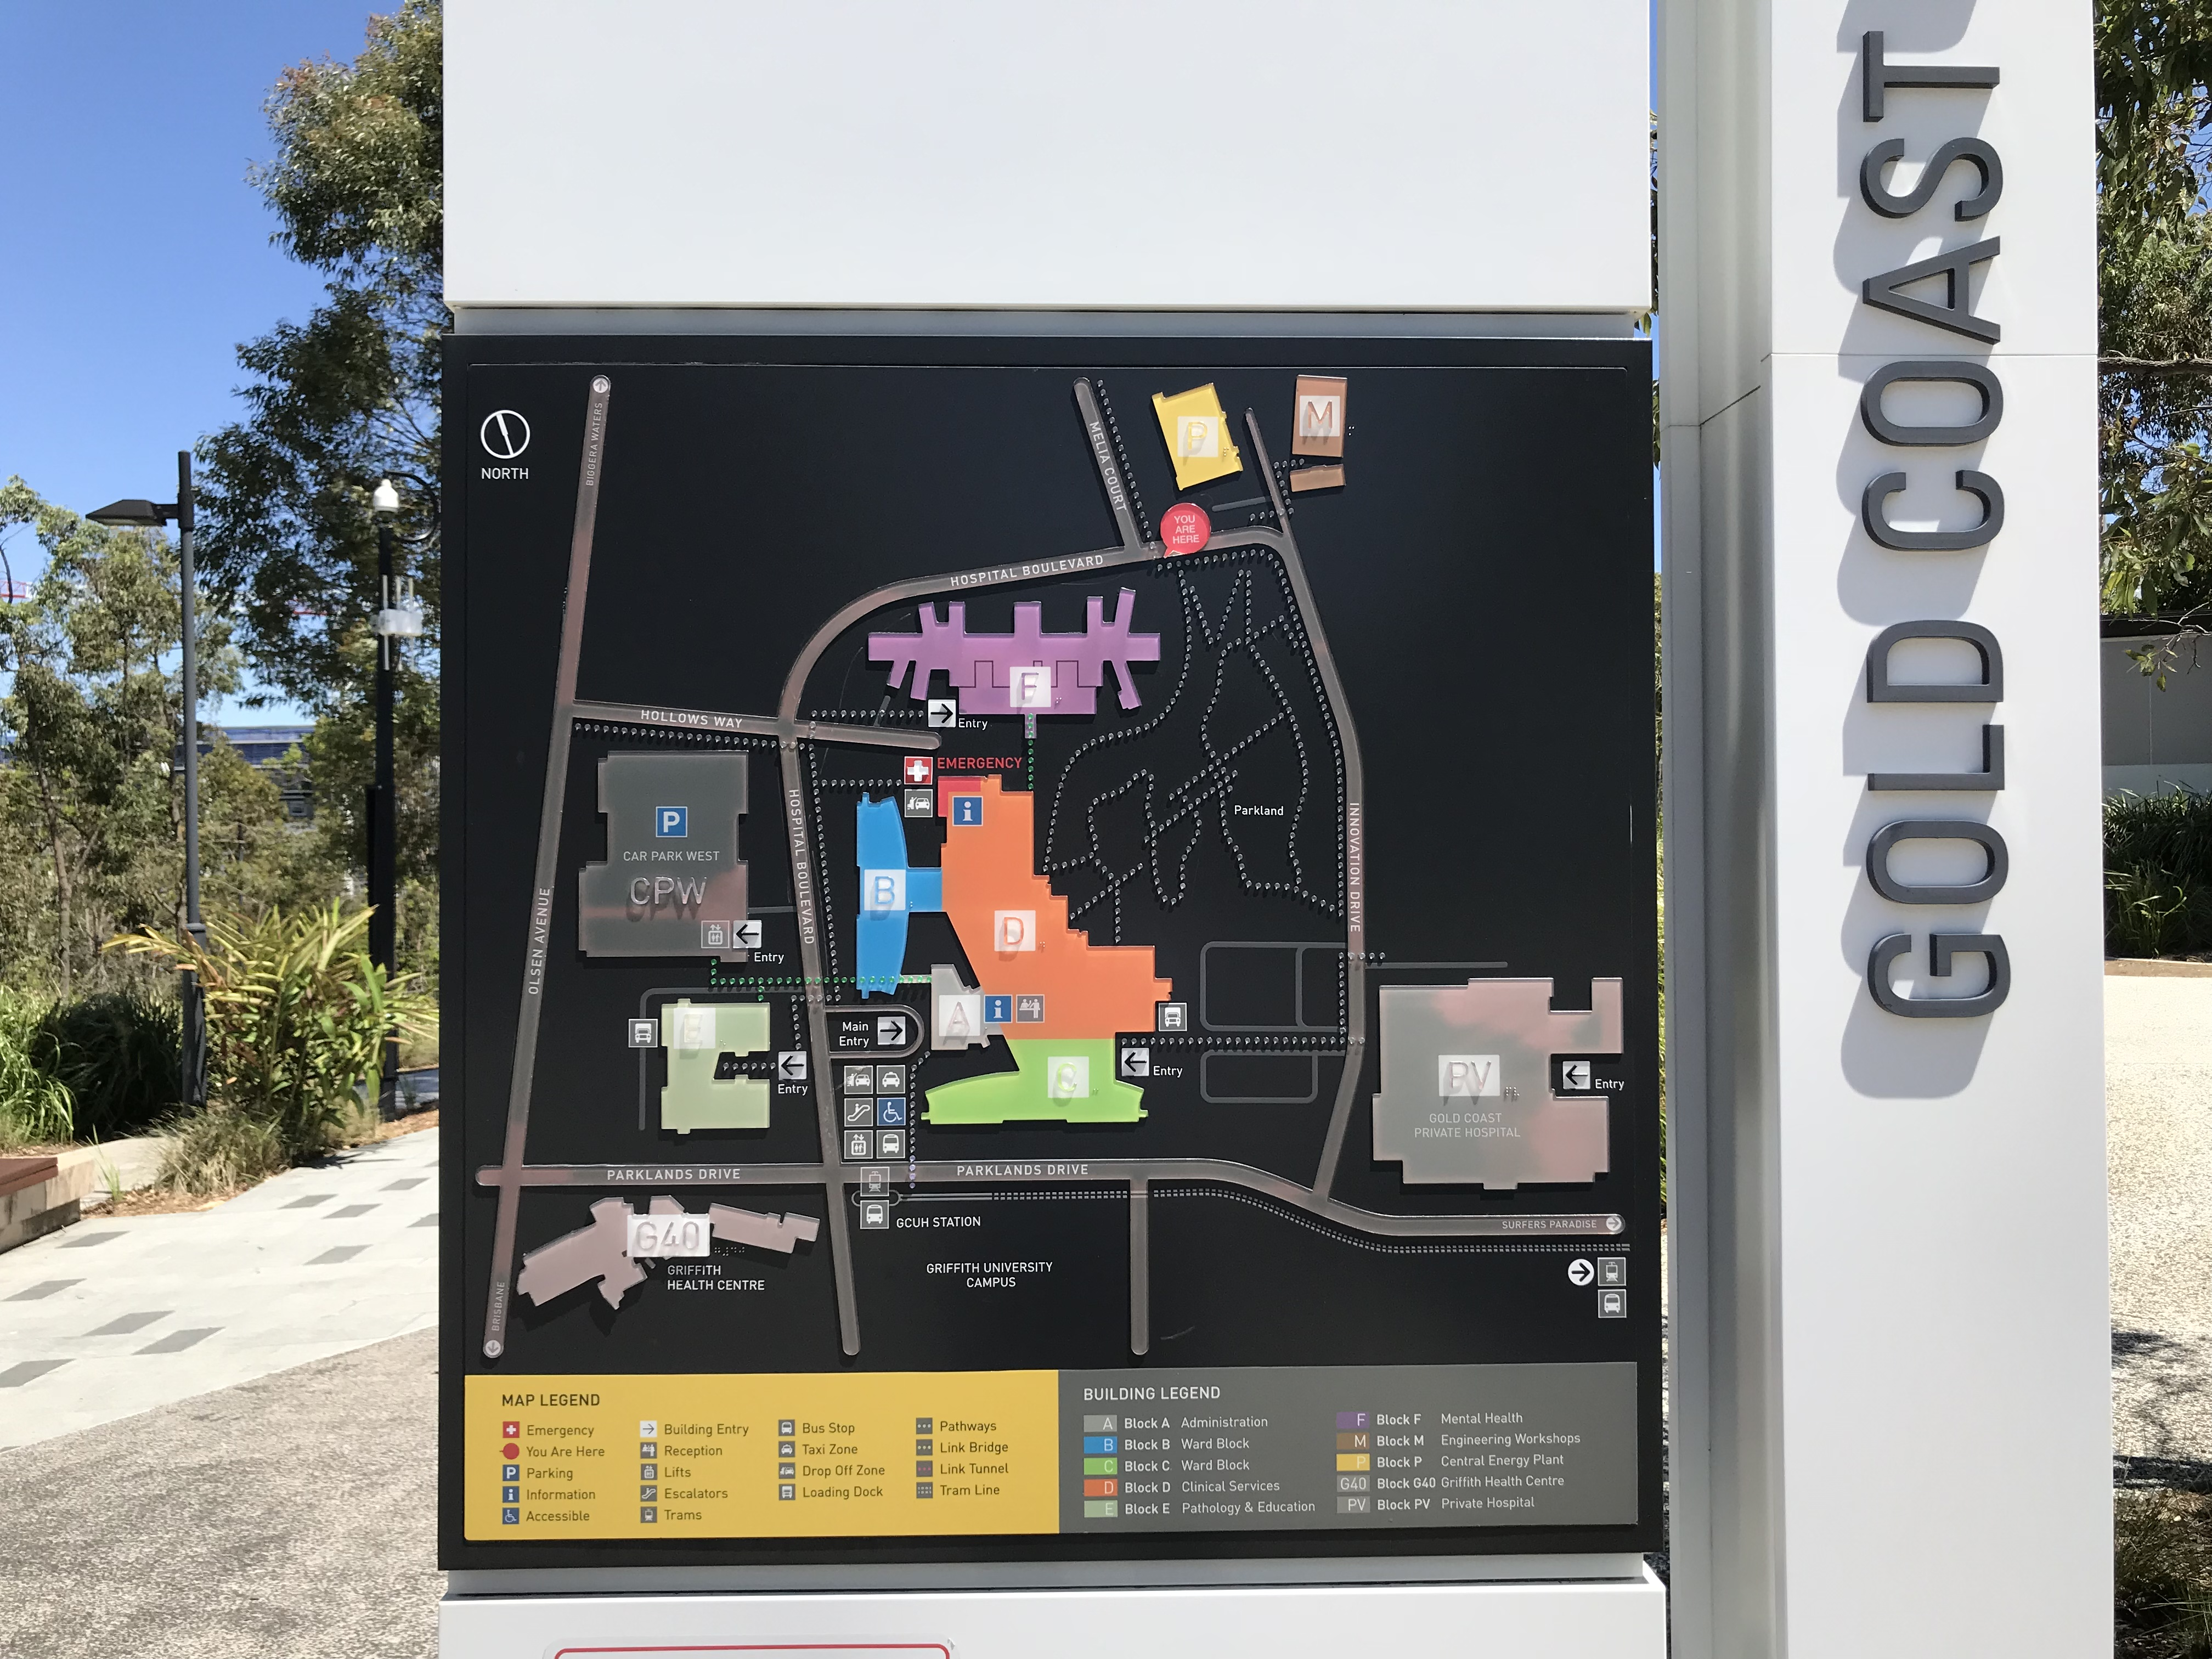 Gold Coast University Hospital Map File:Map and directory display at Gold Coast University Hospital